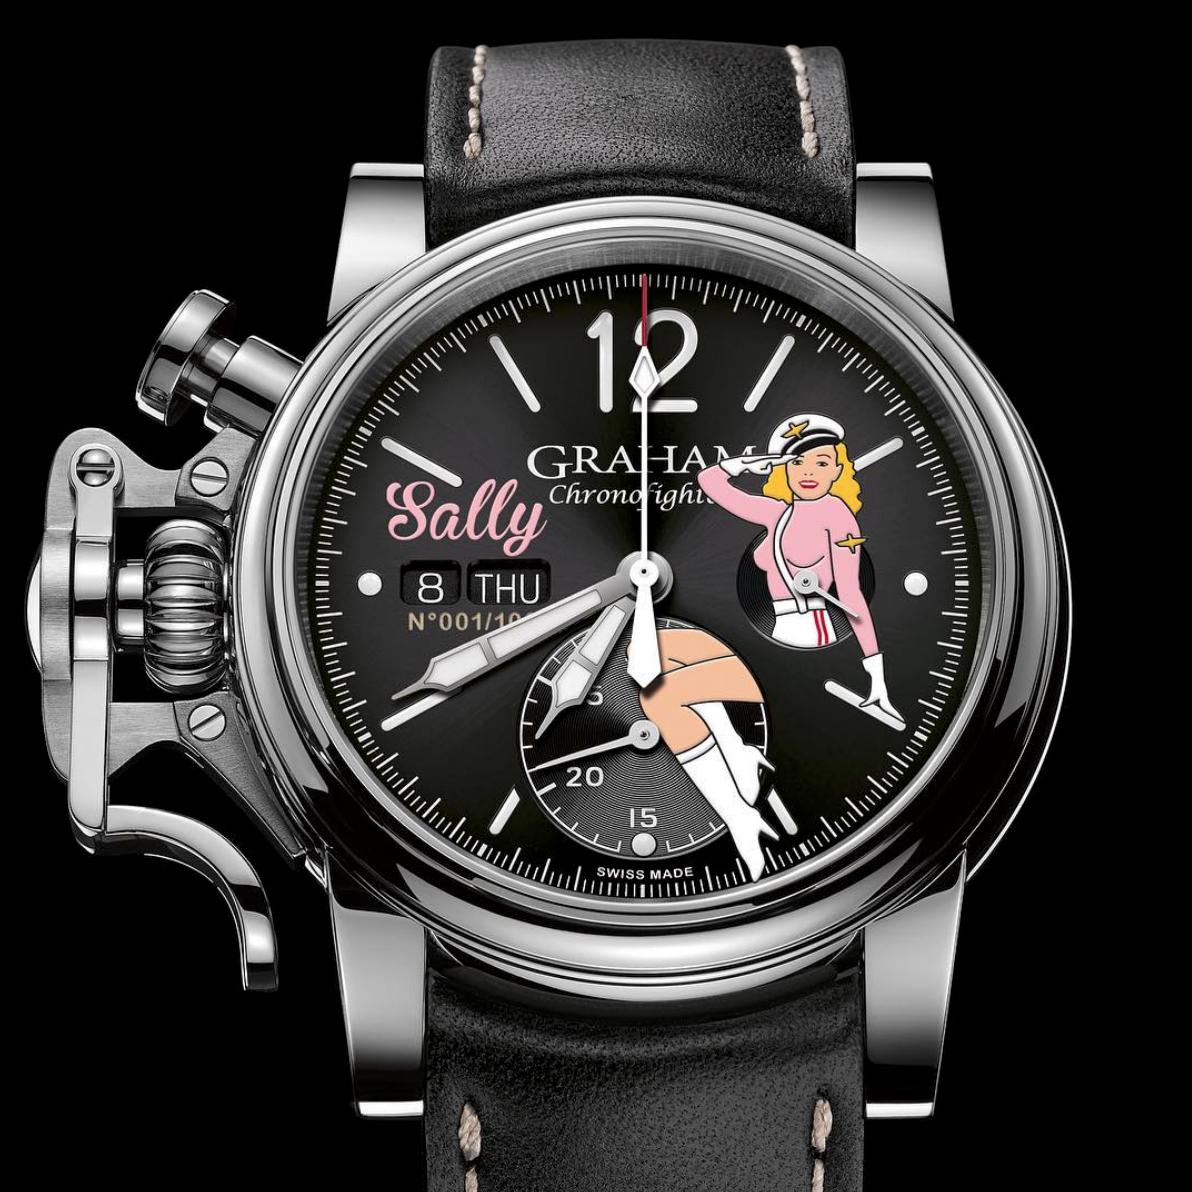 【GRAHAM グラハム】Chronofighter Vintage Nose Art Ltd クロノファイターヴィンテージ ノーズアート『Sally サリー』世界限定100本/国内正規品 腕時計